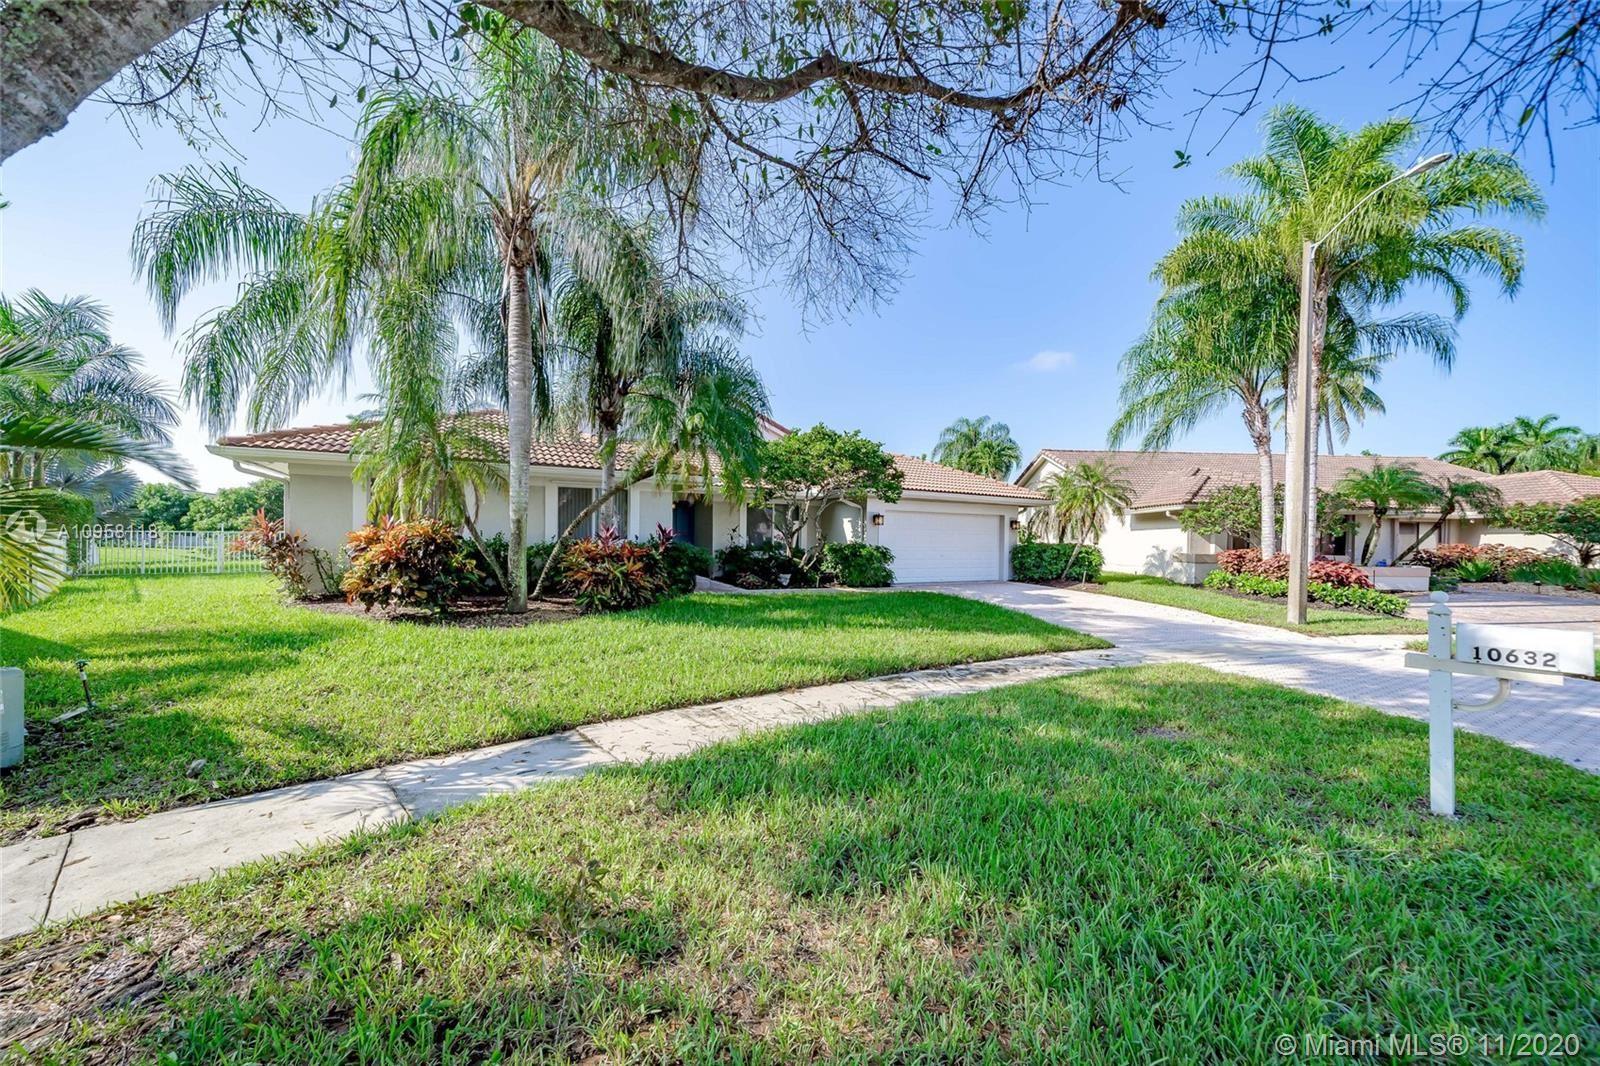 Photo of 10632 NW 7th St, Plantation, FL 33324 (MLS # A10958118)